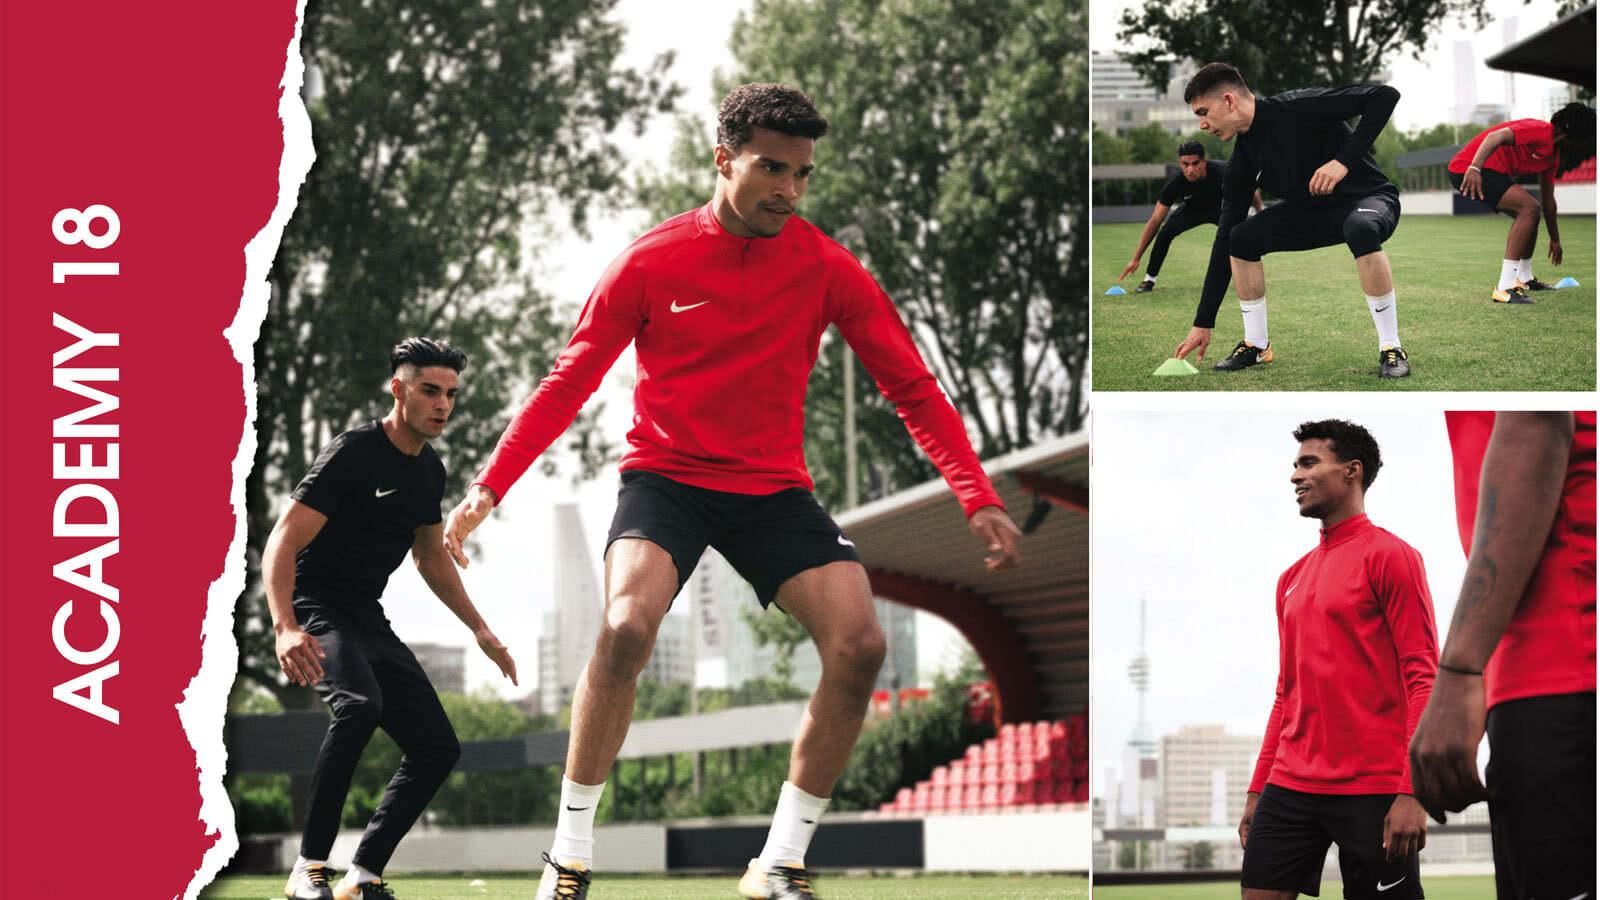 Die Nike Academy 18 Teamline Sportbekleidung